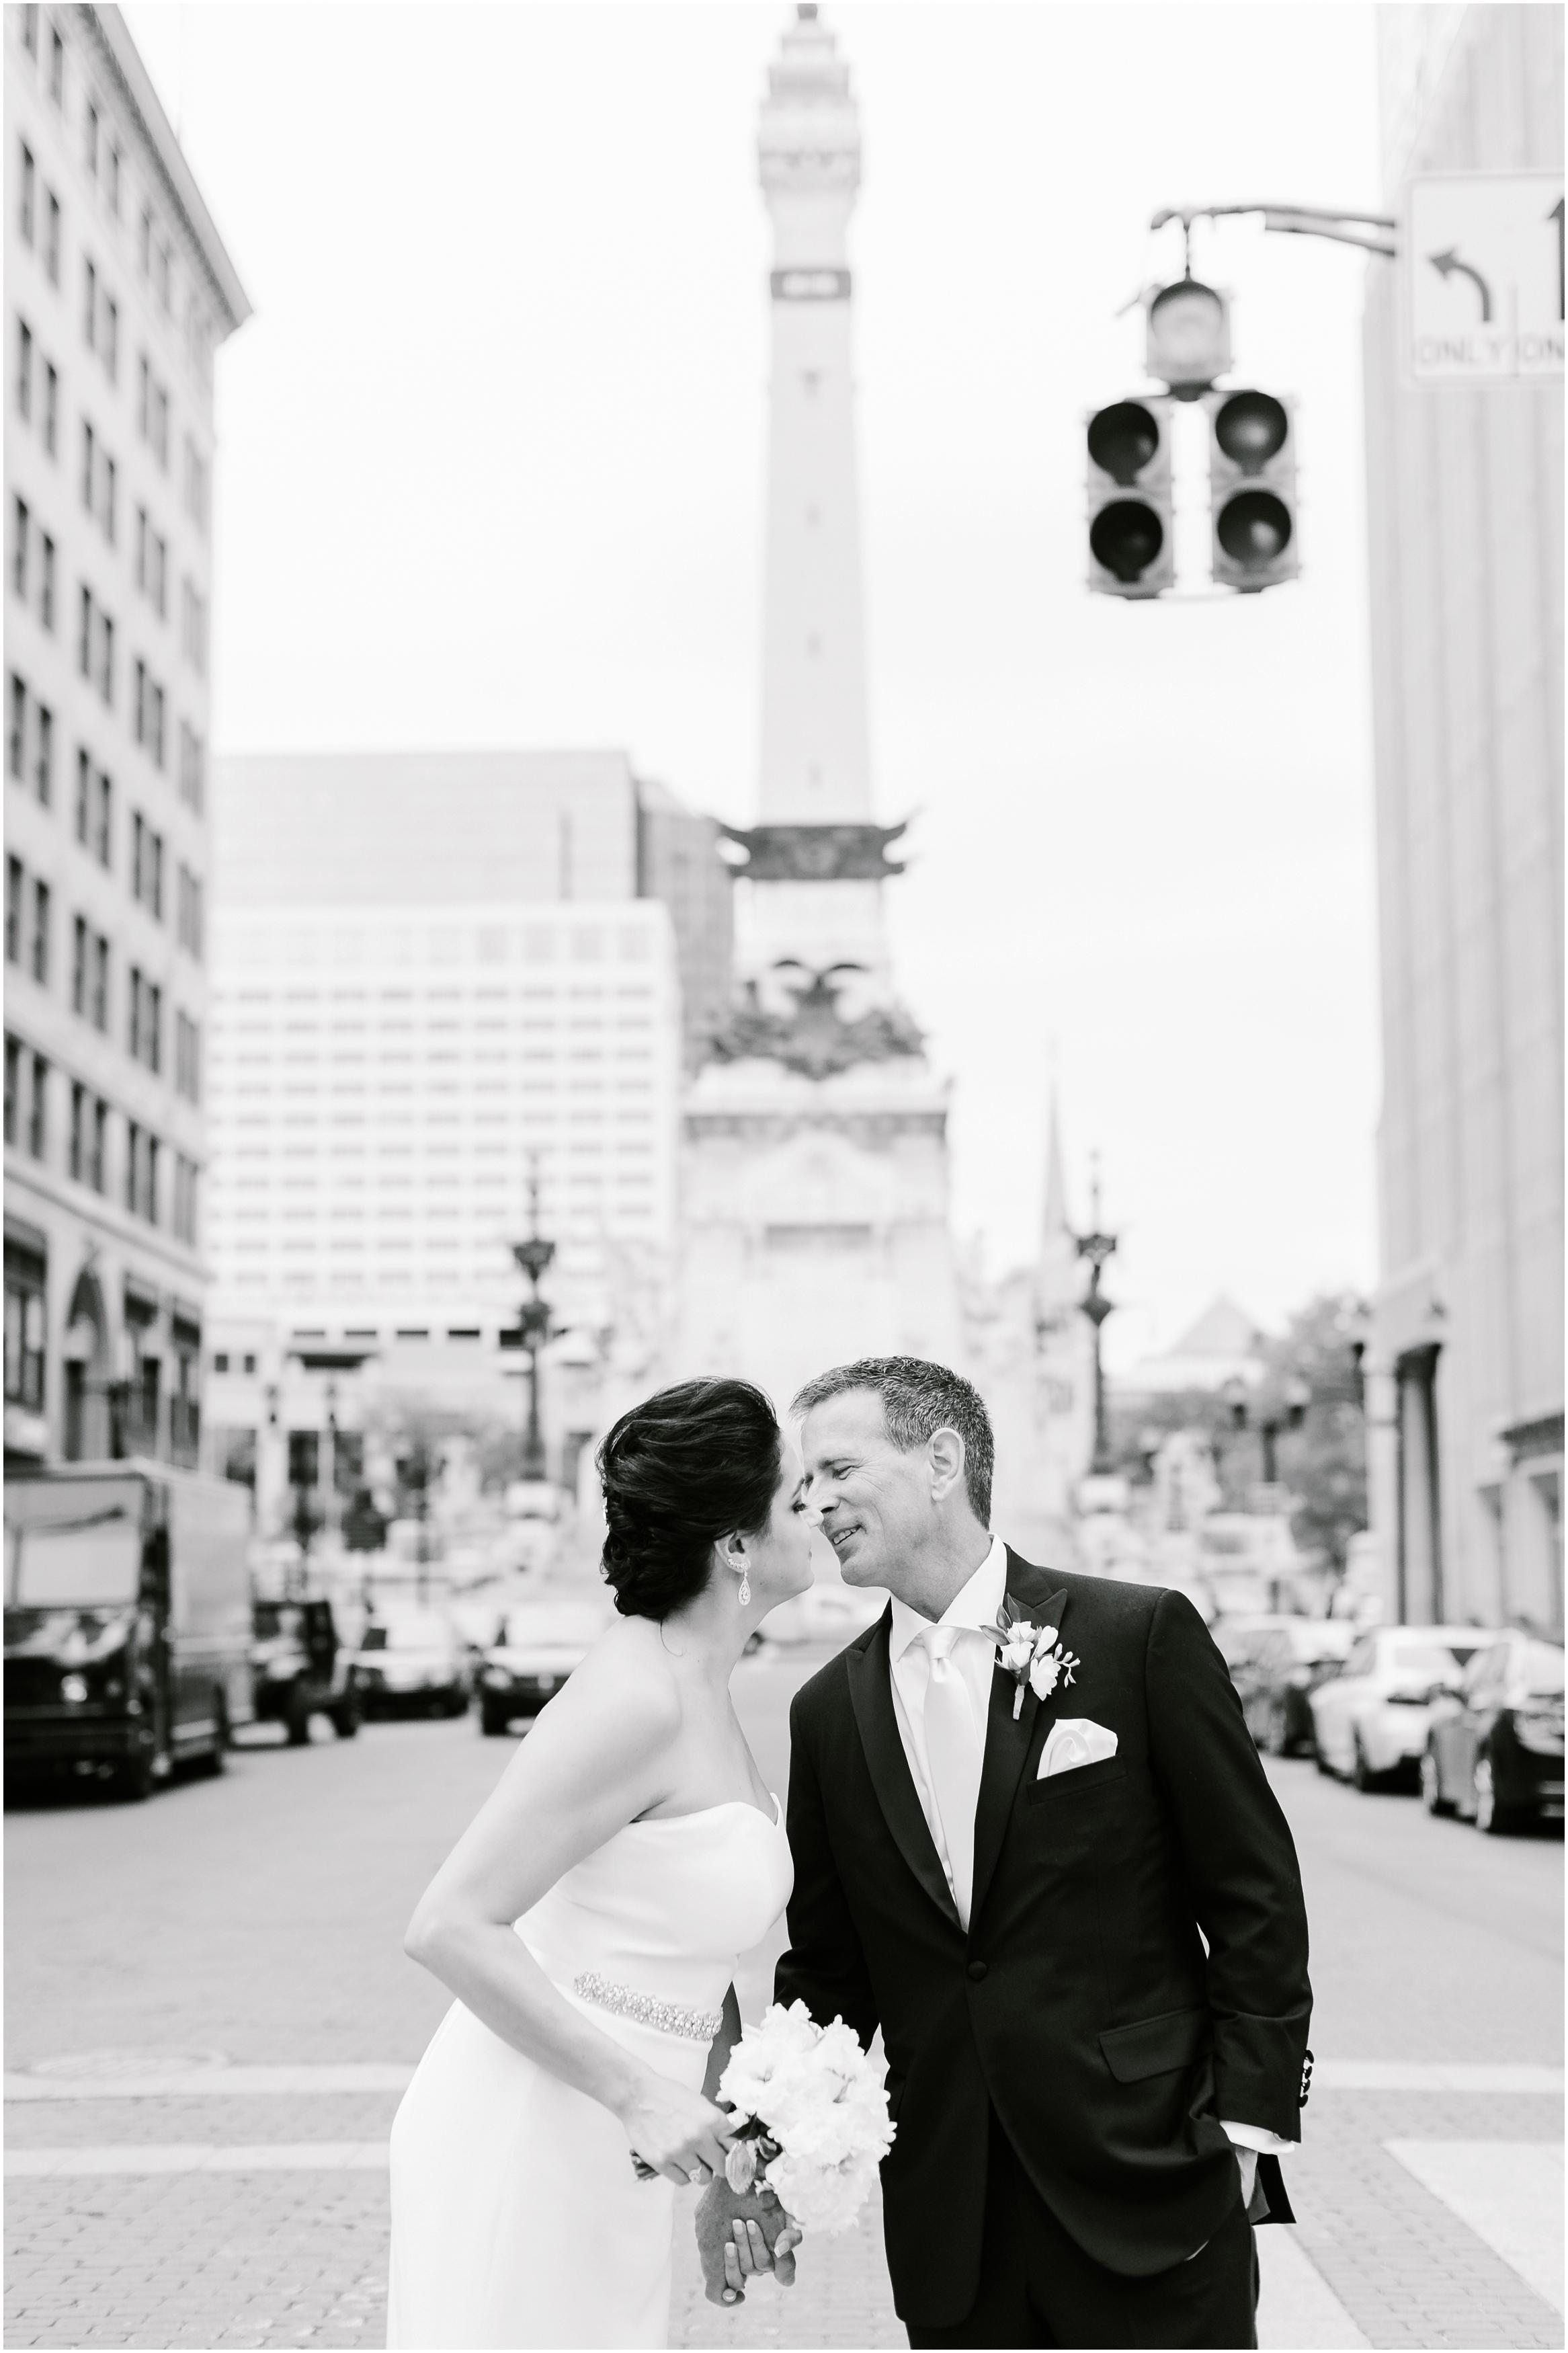 Rebecca_Shehorn_Photography_Indianapolis_Wedding_Photographer_8564.jpg